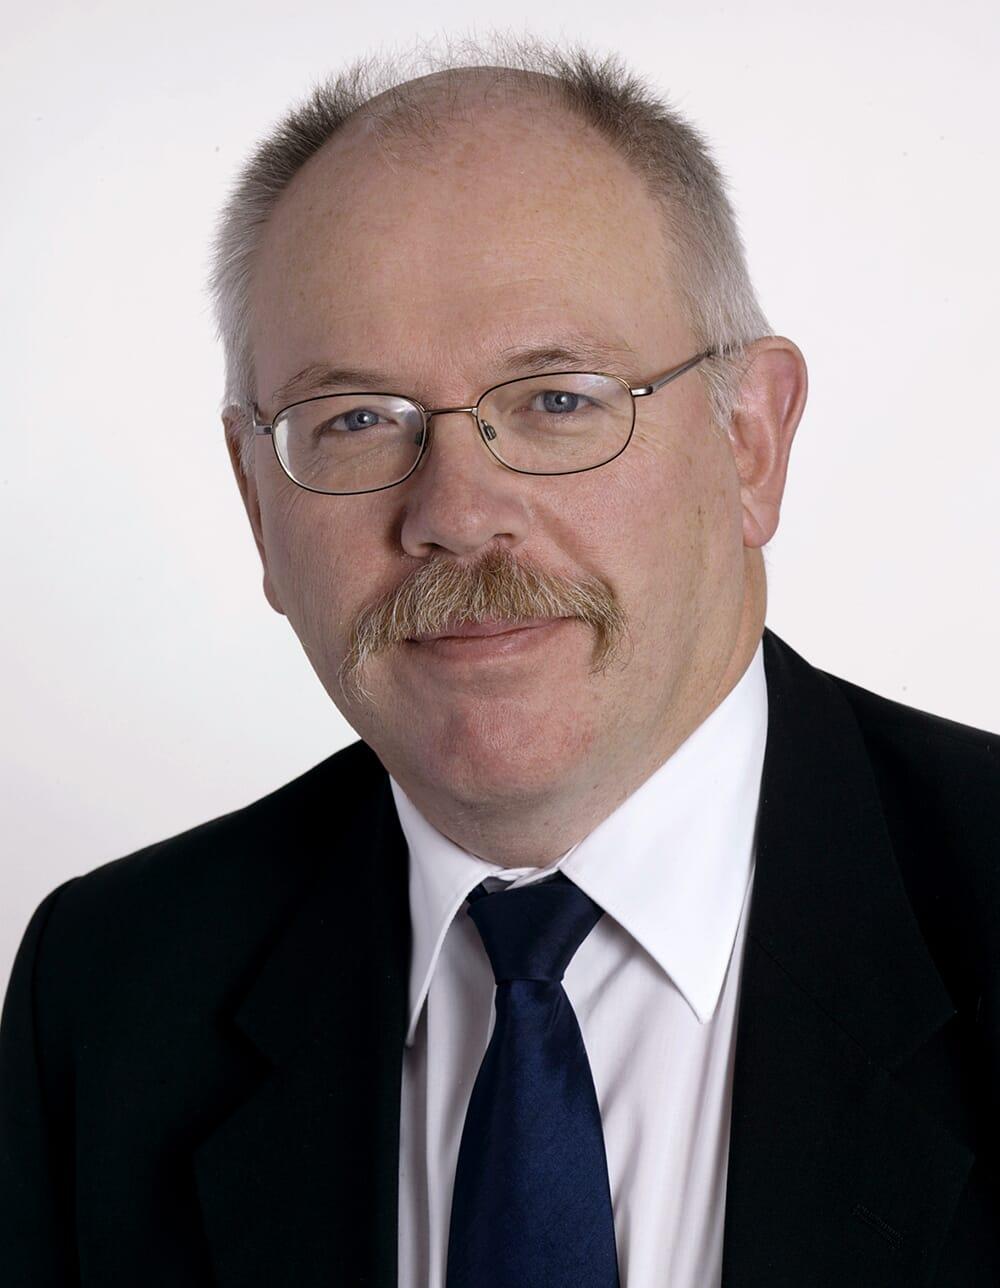 Svante Johansson